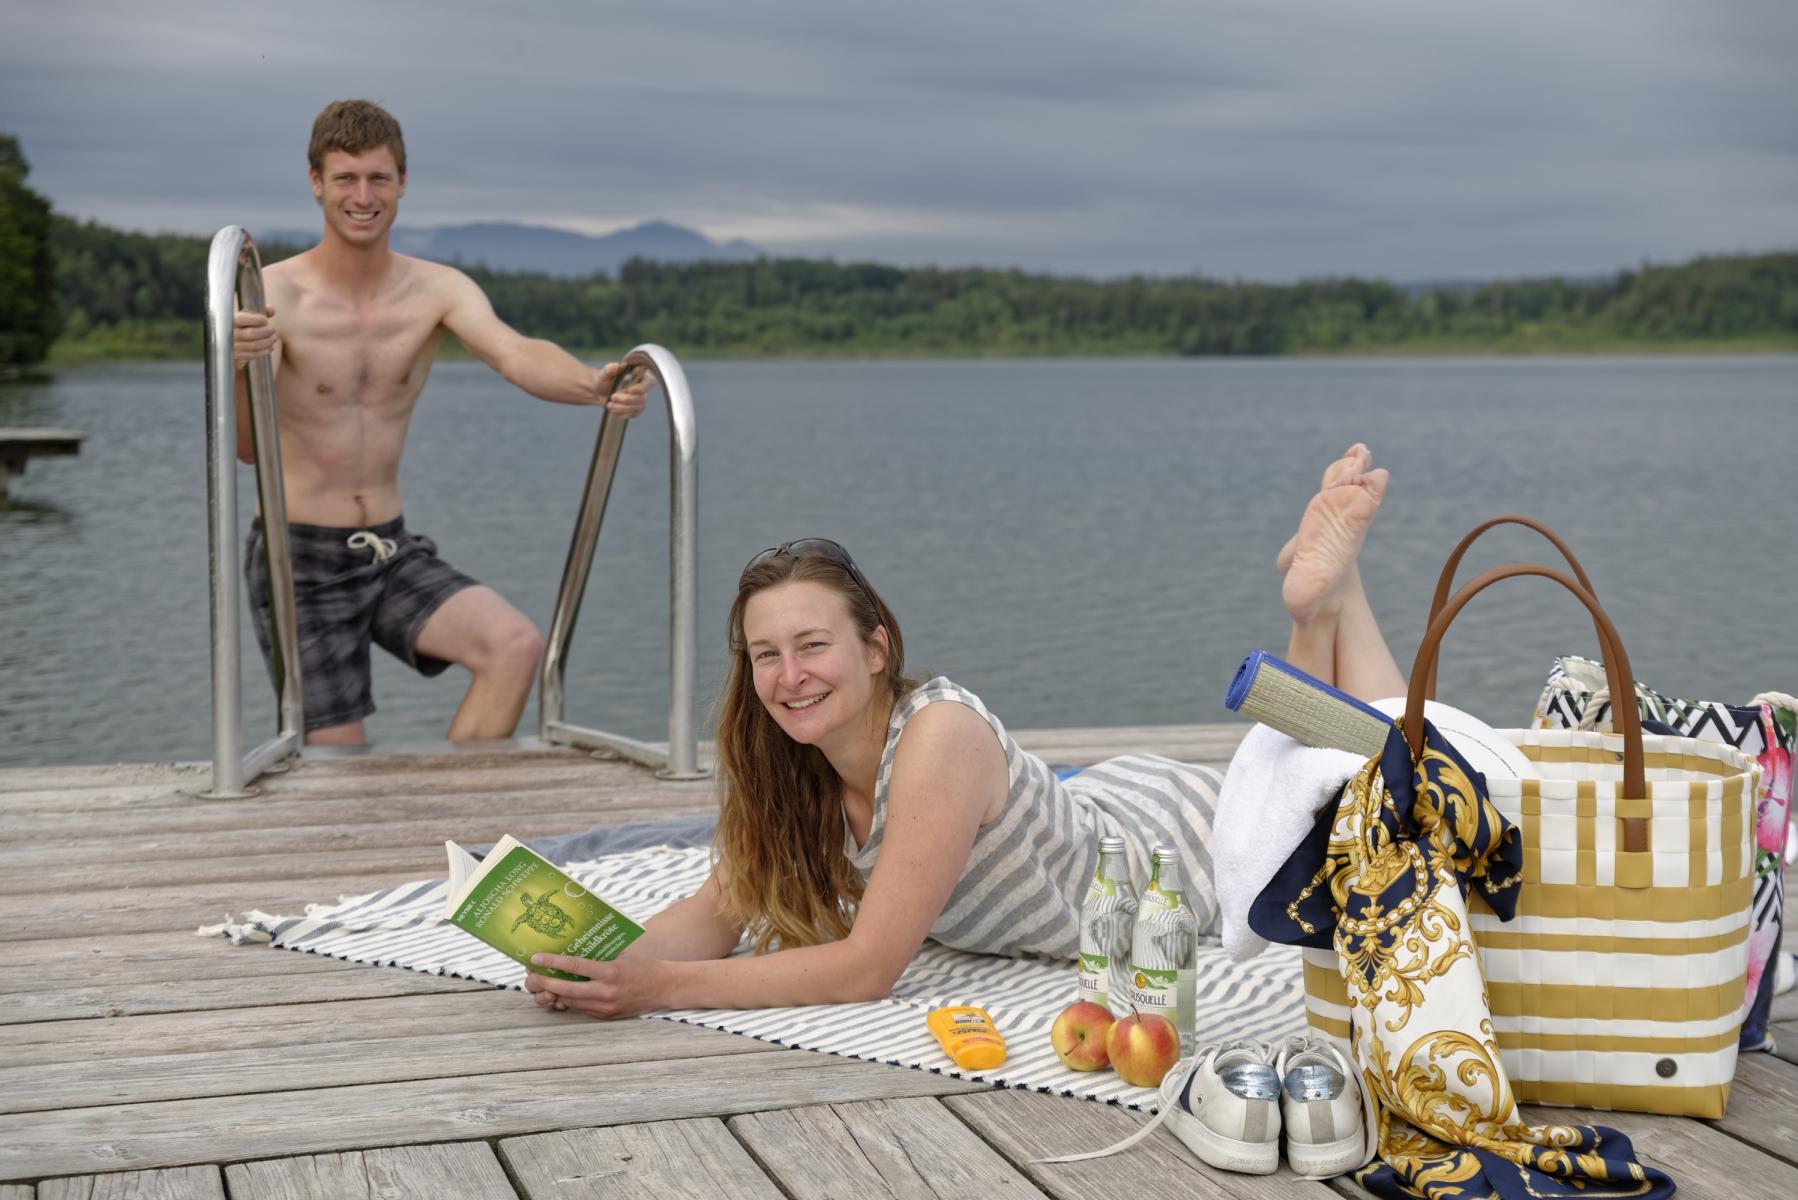 Werbefotografie Tourismus & Wellness Prien am Chiemsee © Fotostudio Blauhorn